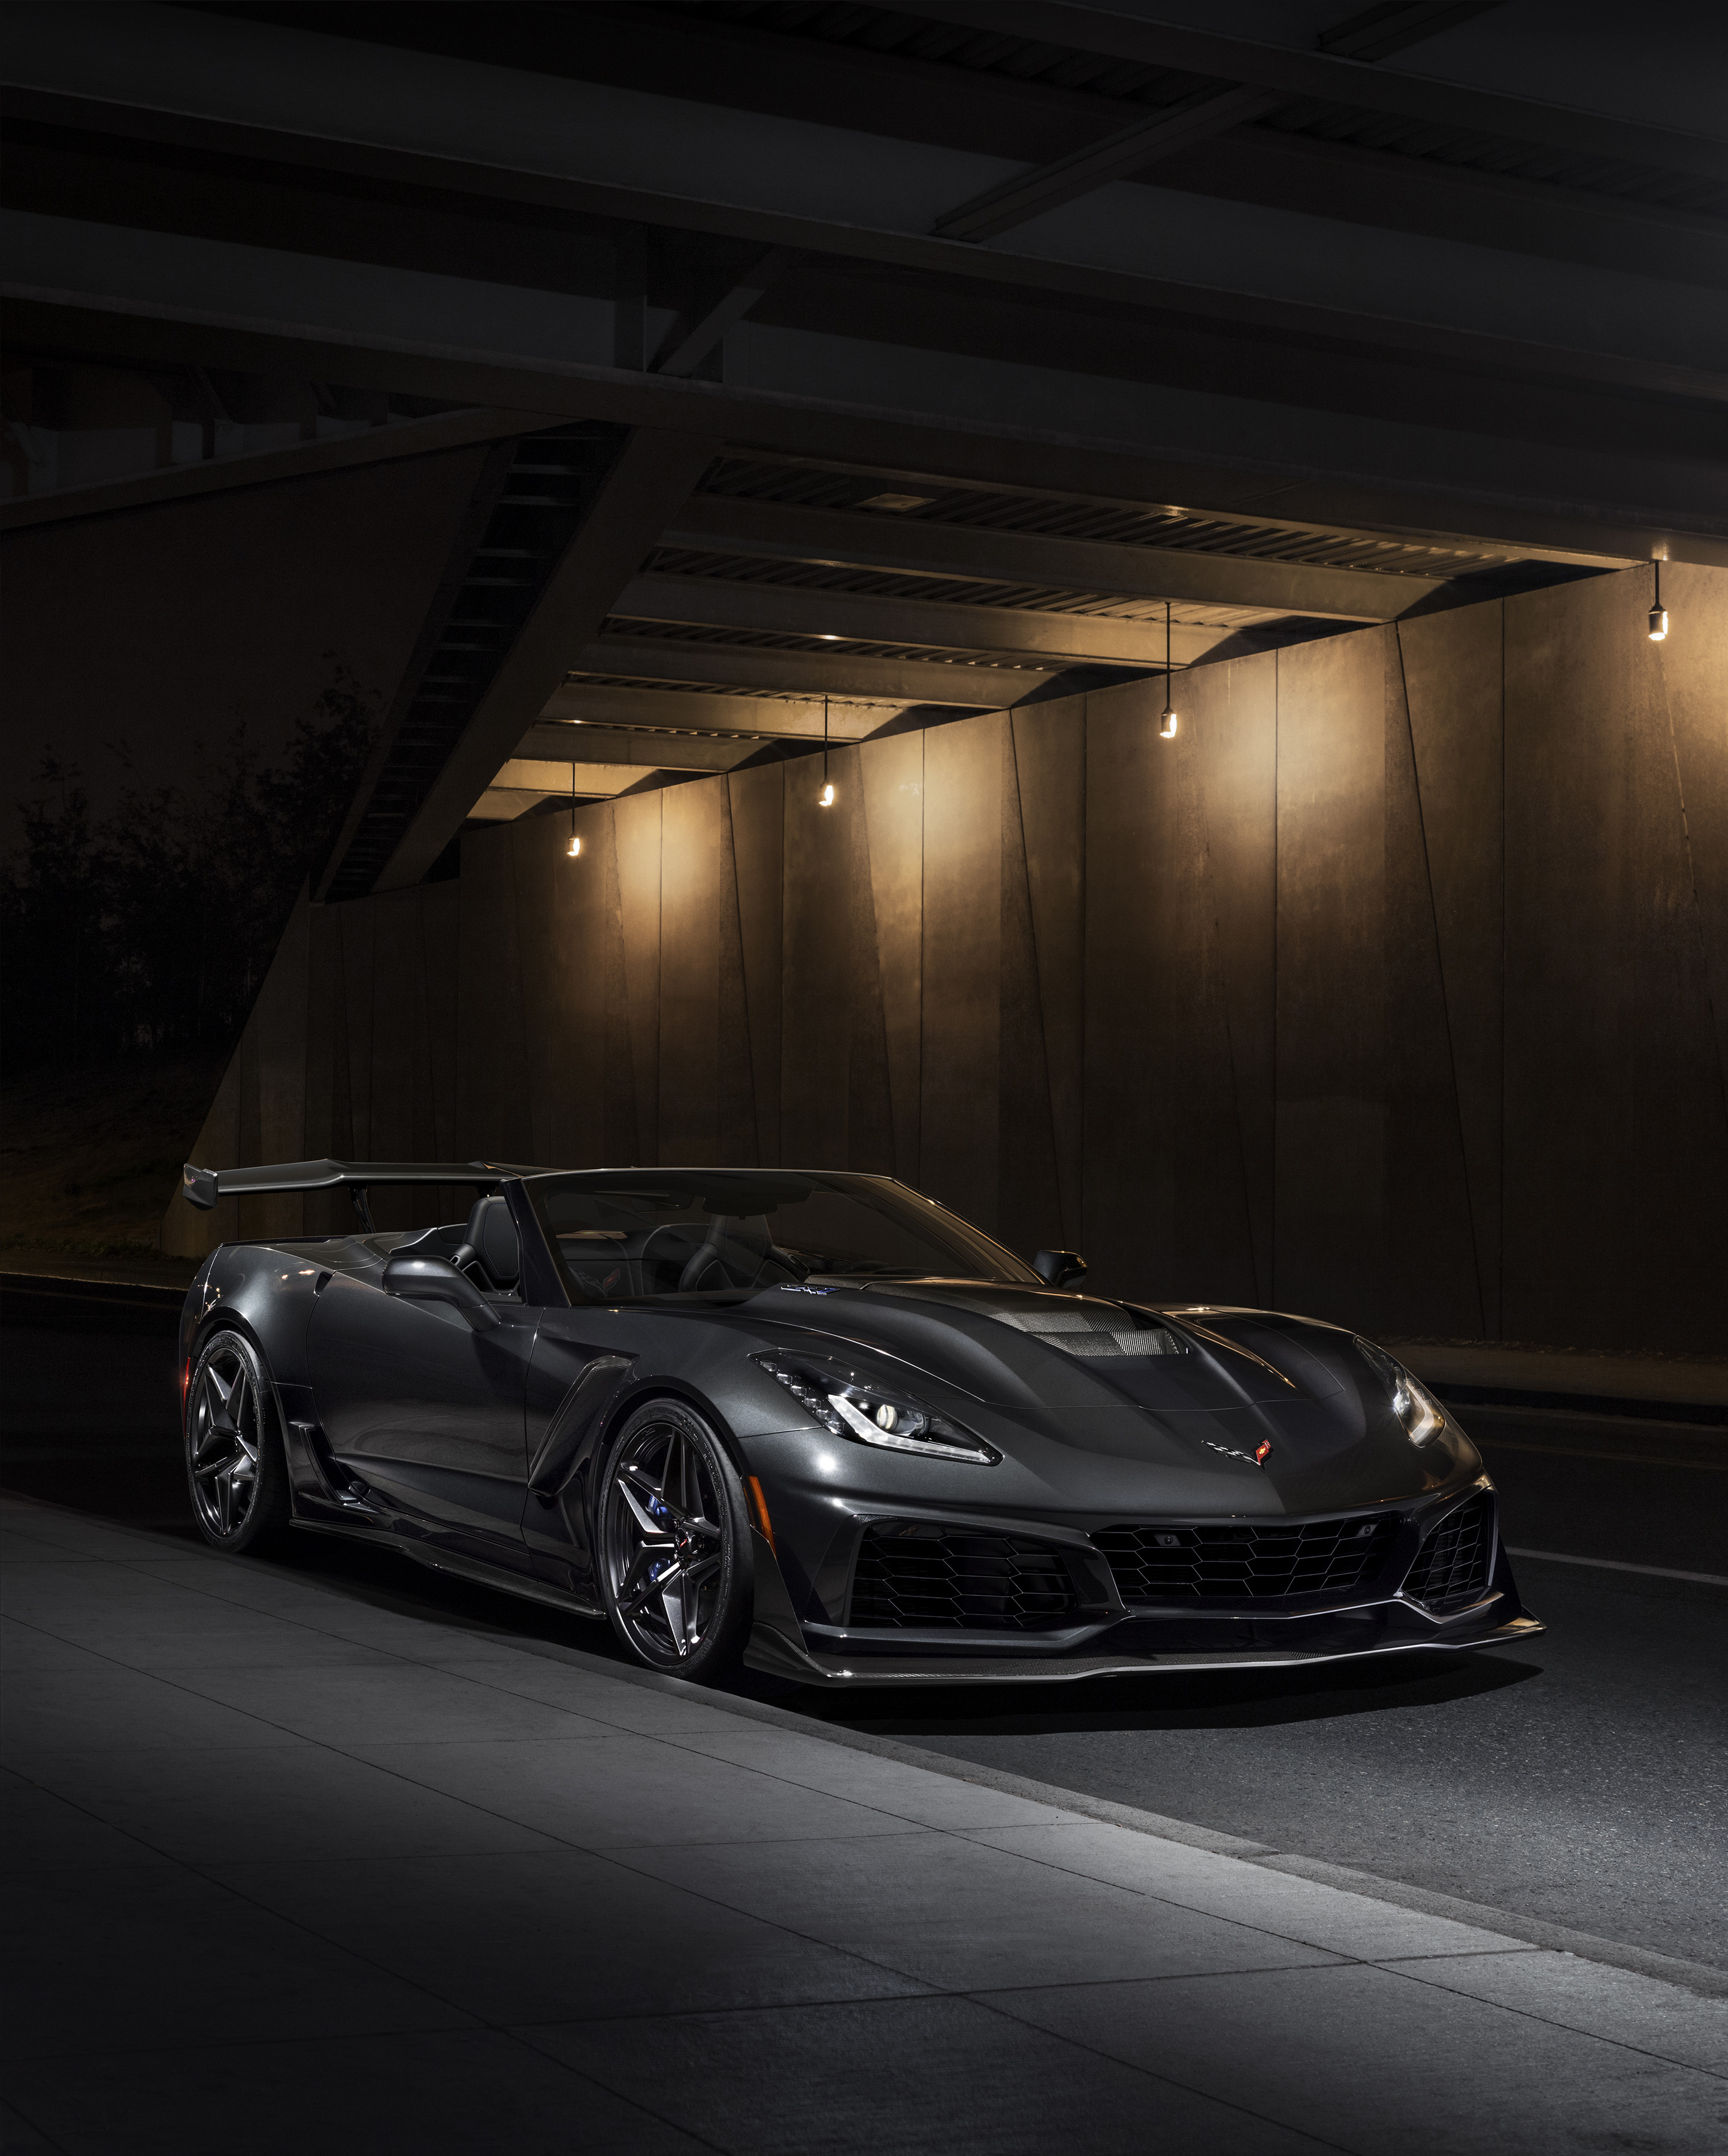 Kekurangan Corvette Zr1 2019 Spesifikasi